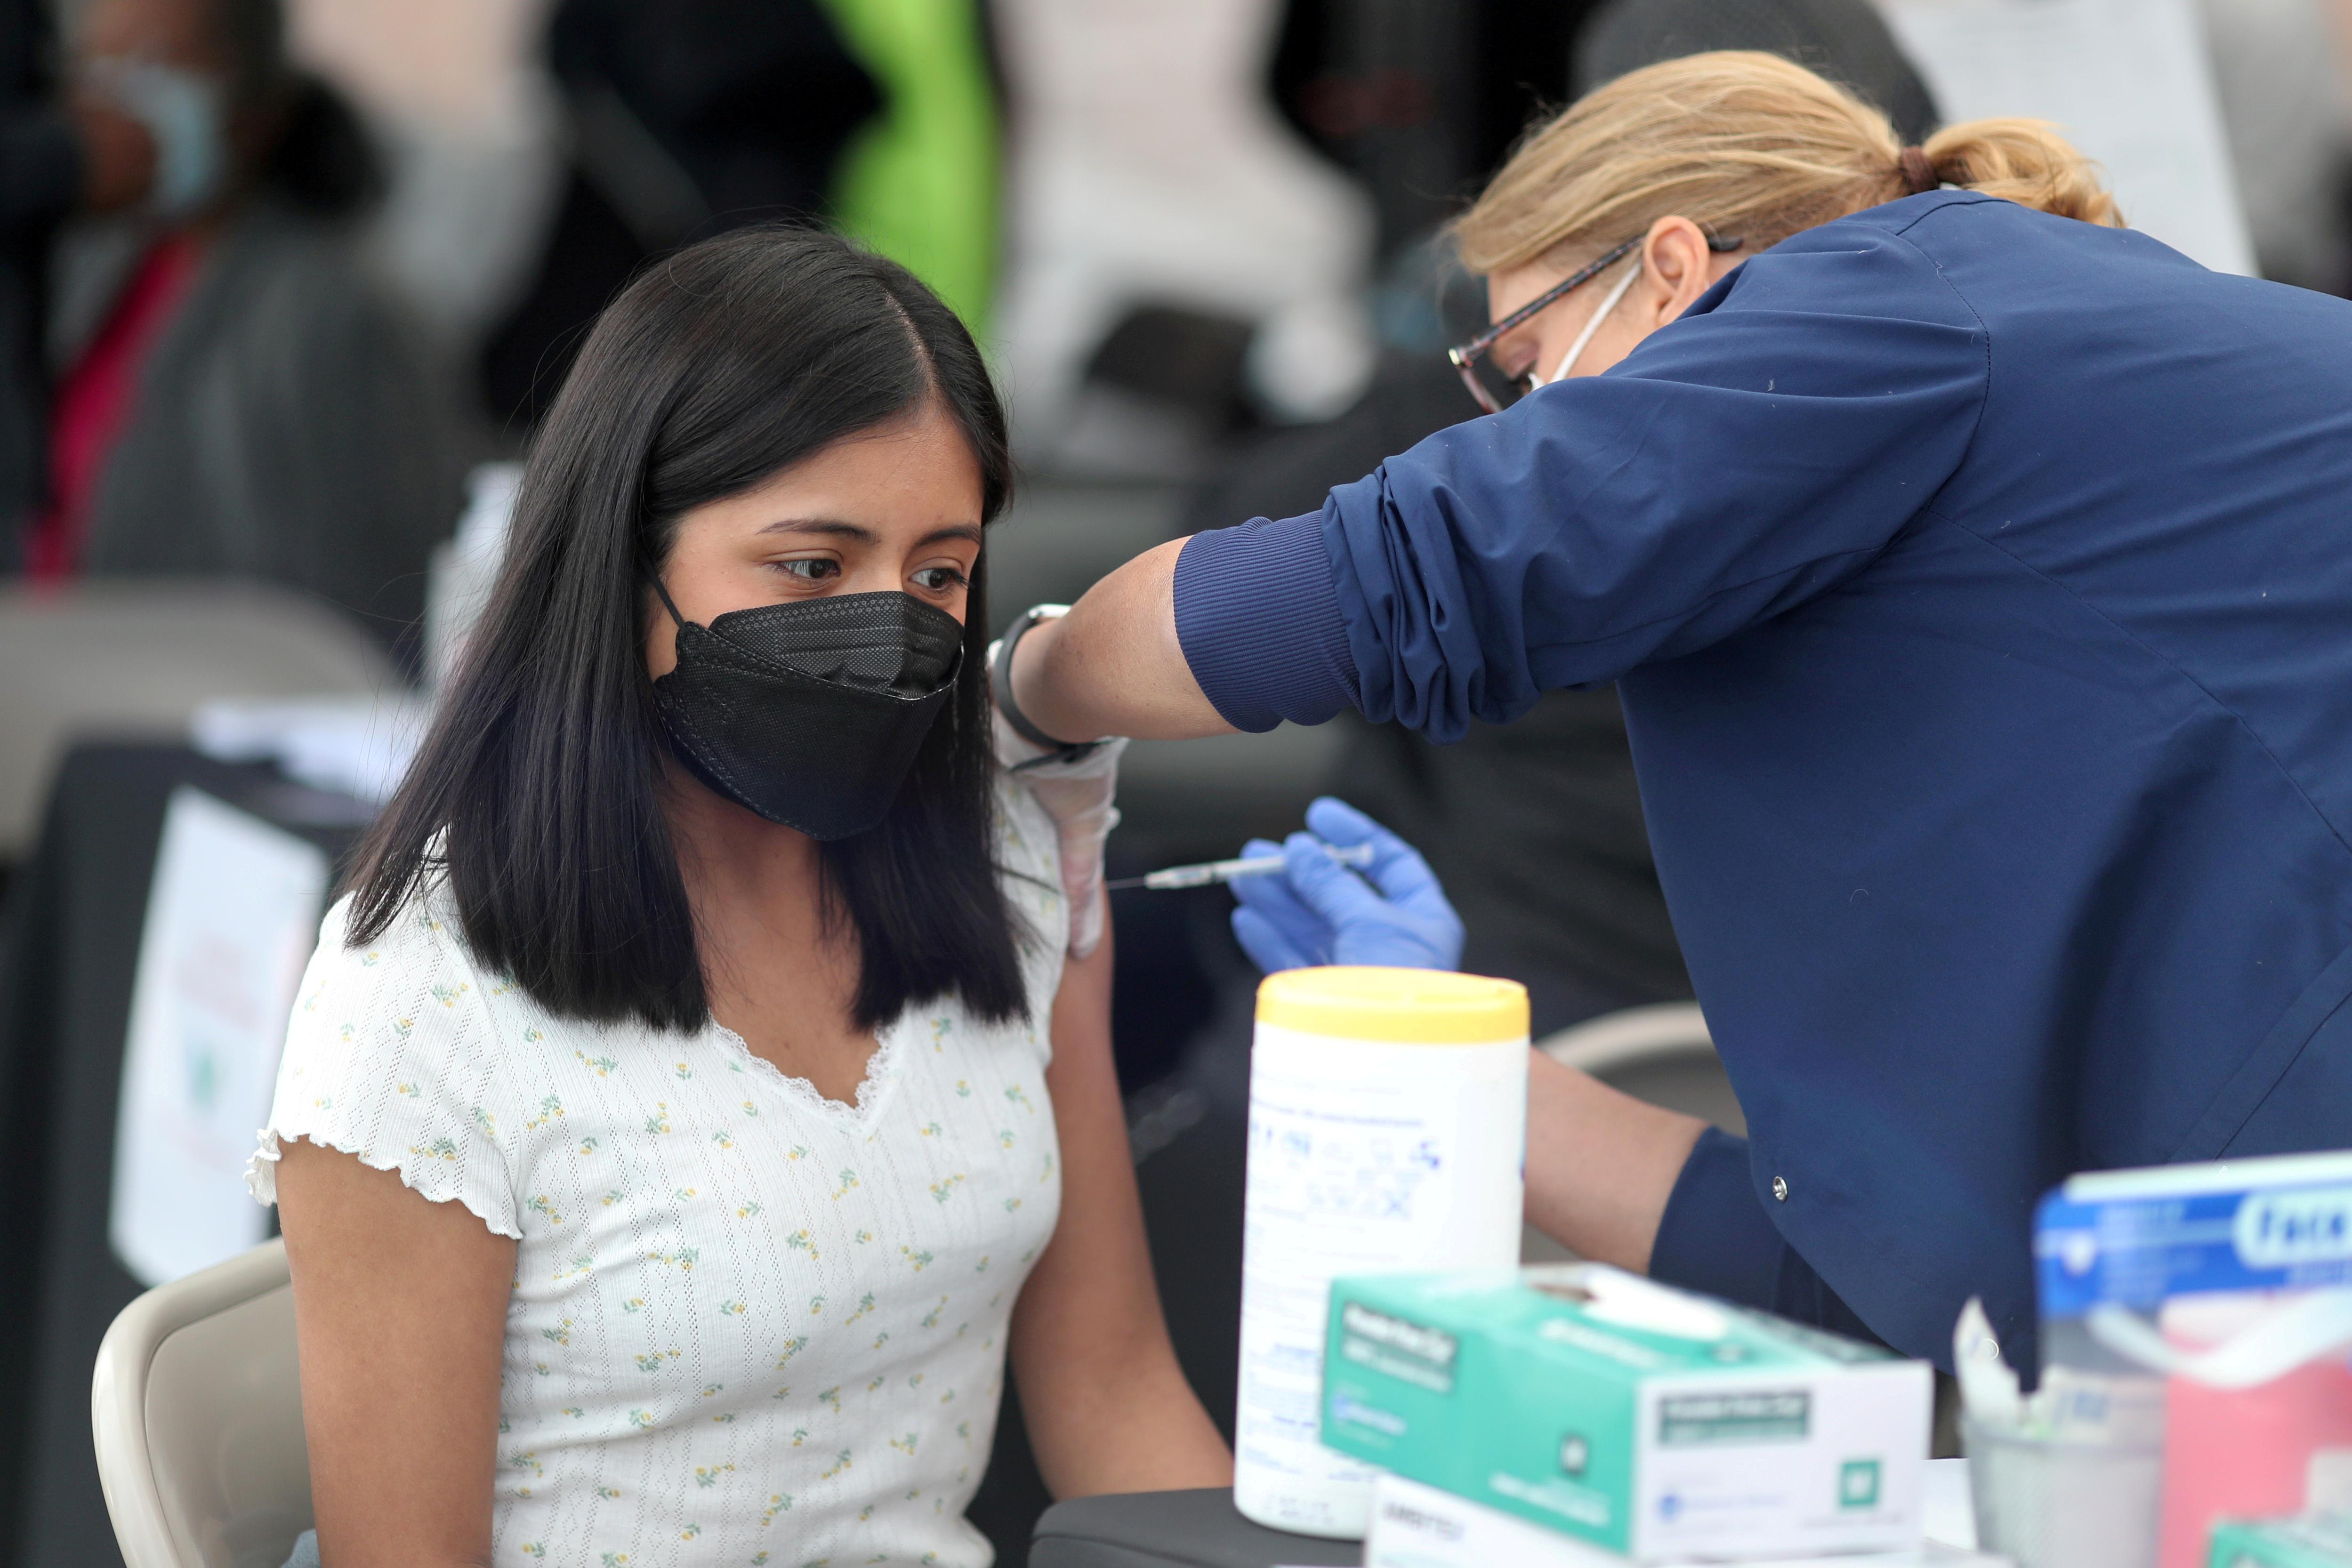 A woman receives a coronavirus disease (COVID-19) vaccination, at Jordan Downs in Los Angeles, California, U.S., March 10, 2021. REUTERS/Lucy Nicholson